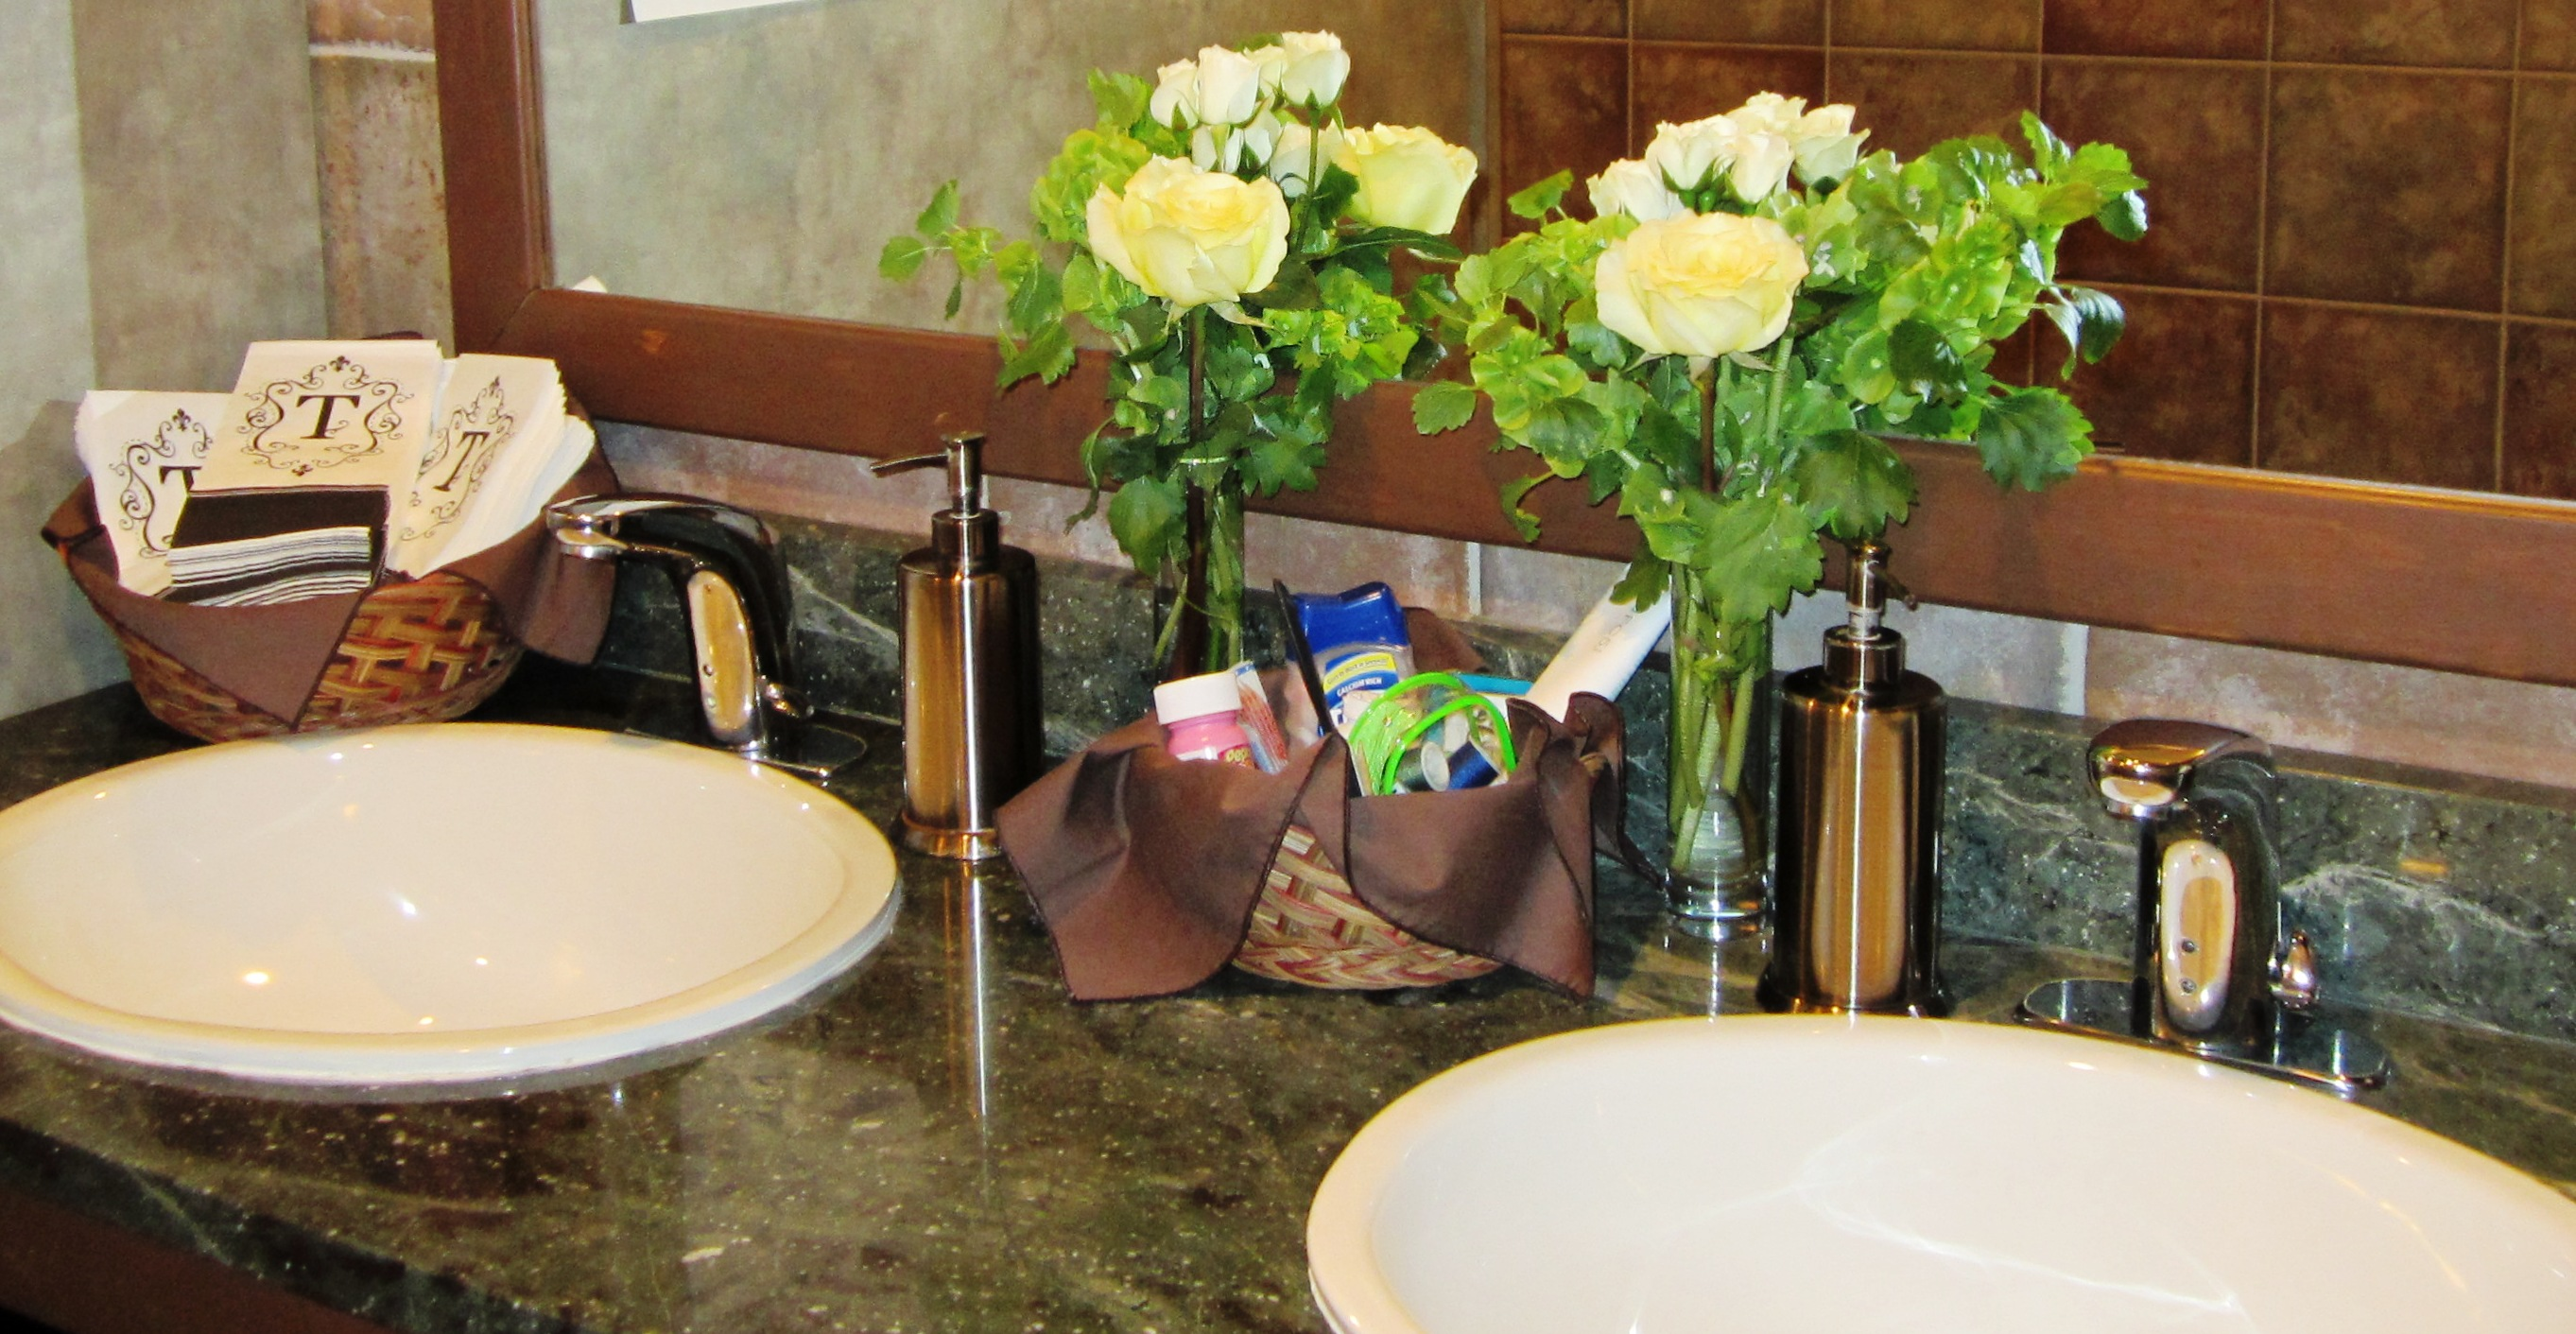 Bathroom Decorations For Wedding : Wedding venue flowers belaireflowers